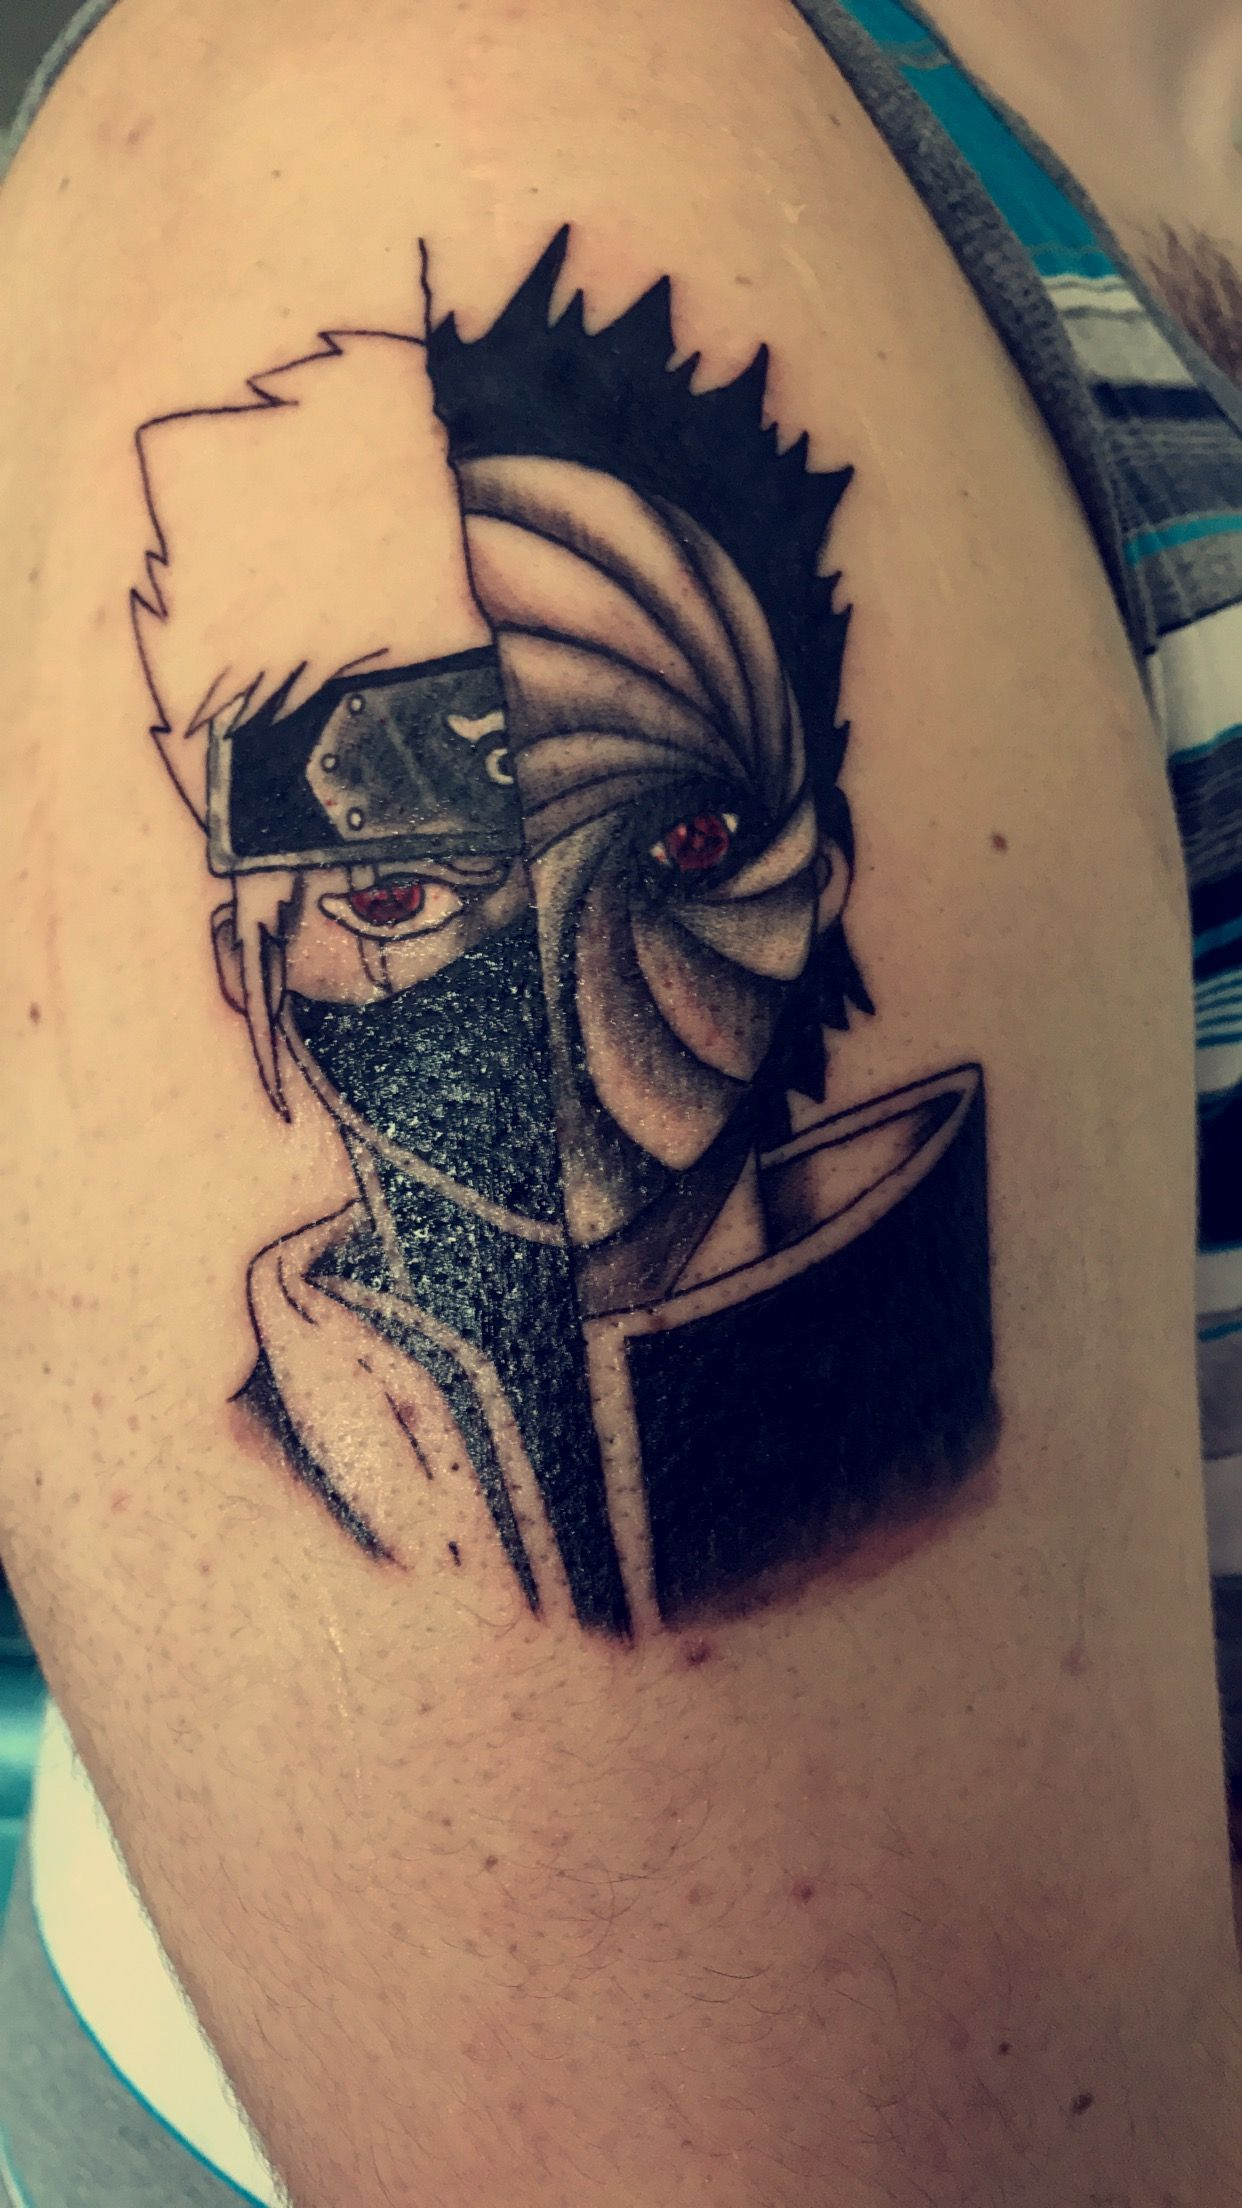 Newest tattoo! #Kakashi #Obito #Naruto #Tattoo #Ink # ...